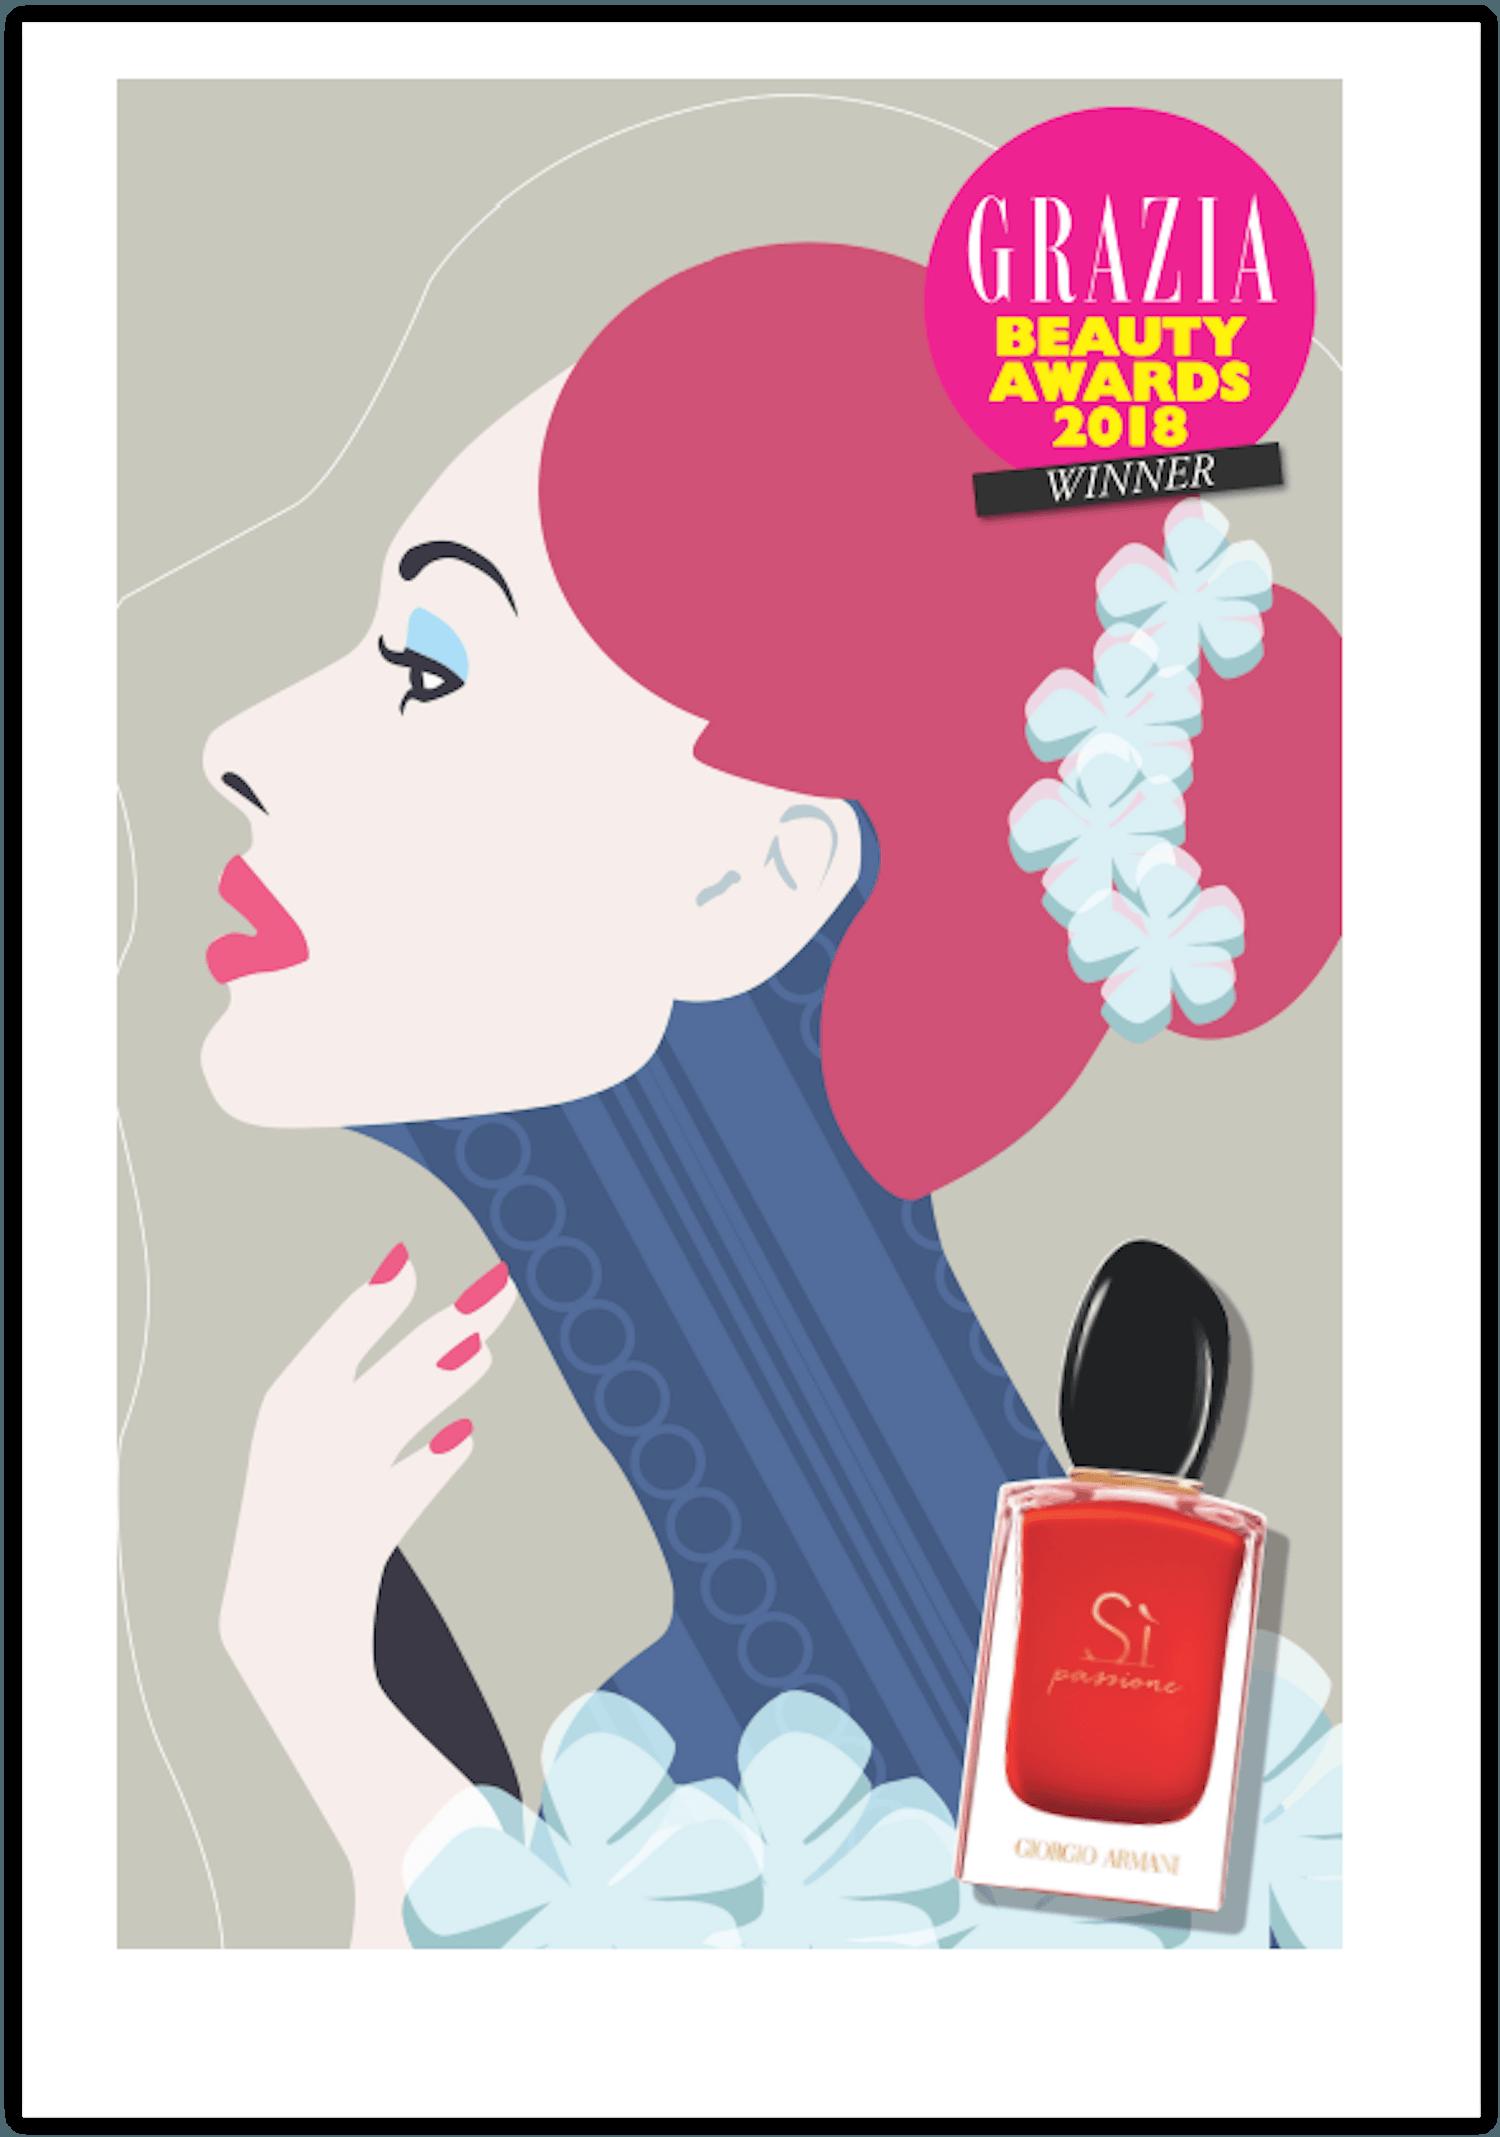 Grazia Beauty Awards 2018 Beautyfyllblog giorgio armani si passione